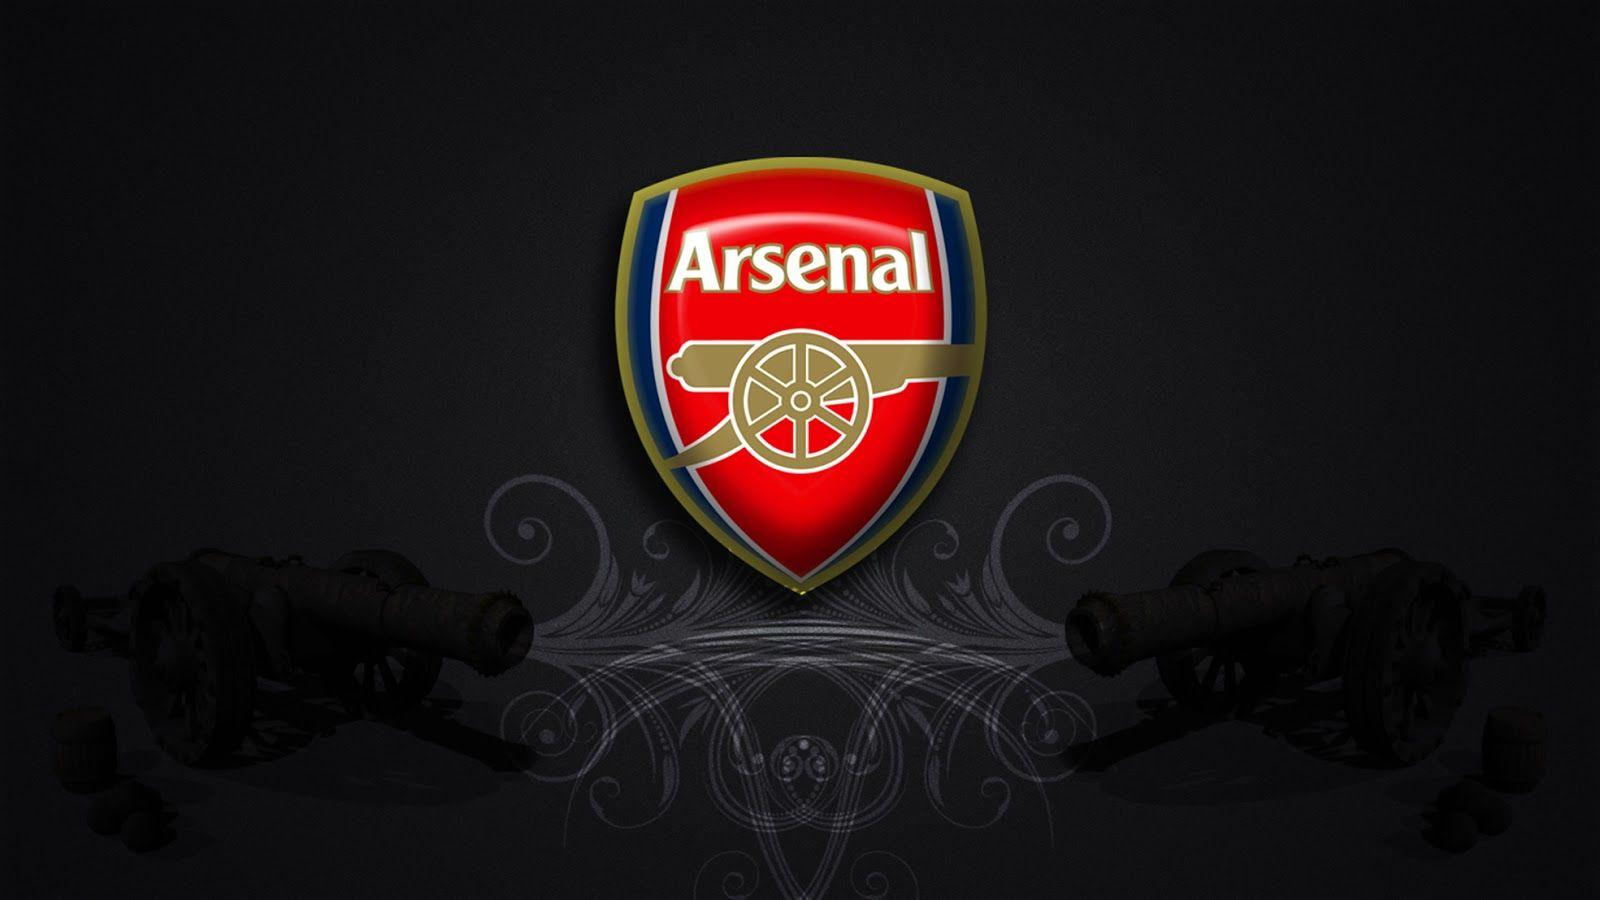 Premier League Football Teams, Schedule, Results, Scores, Players